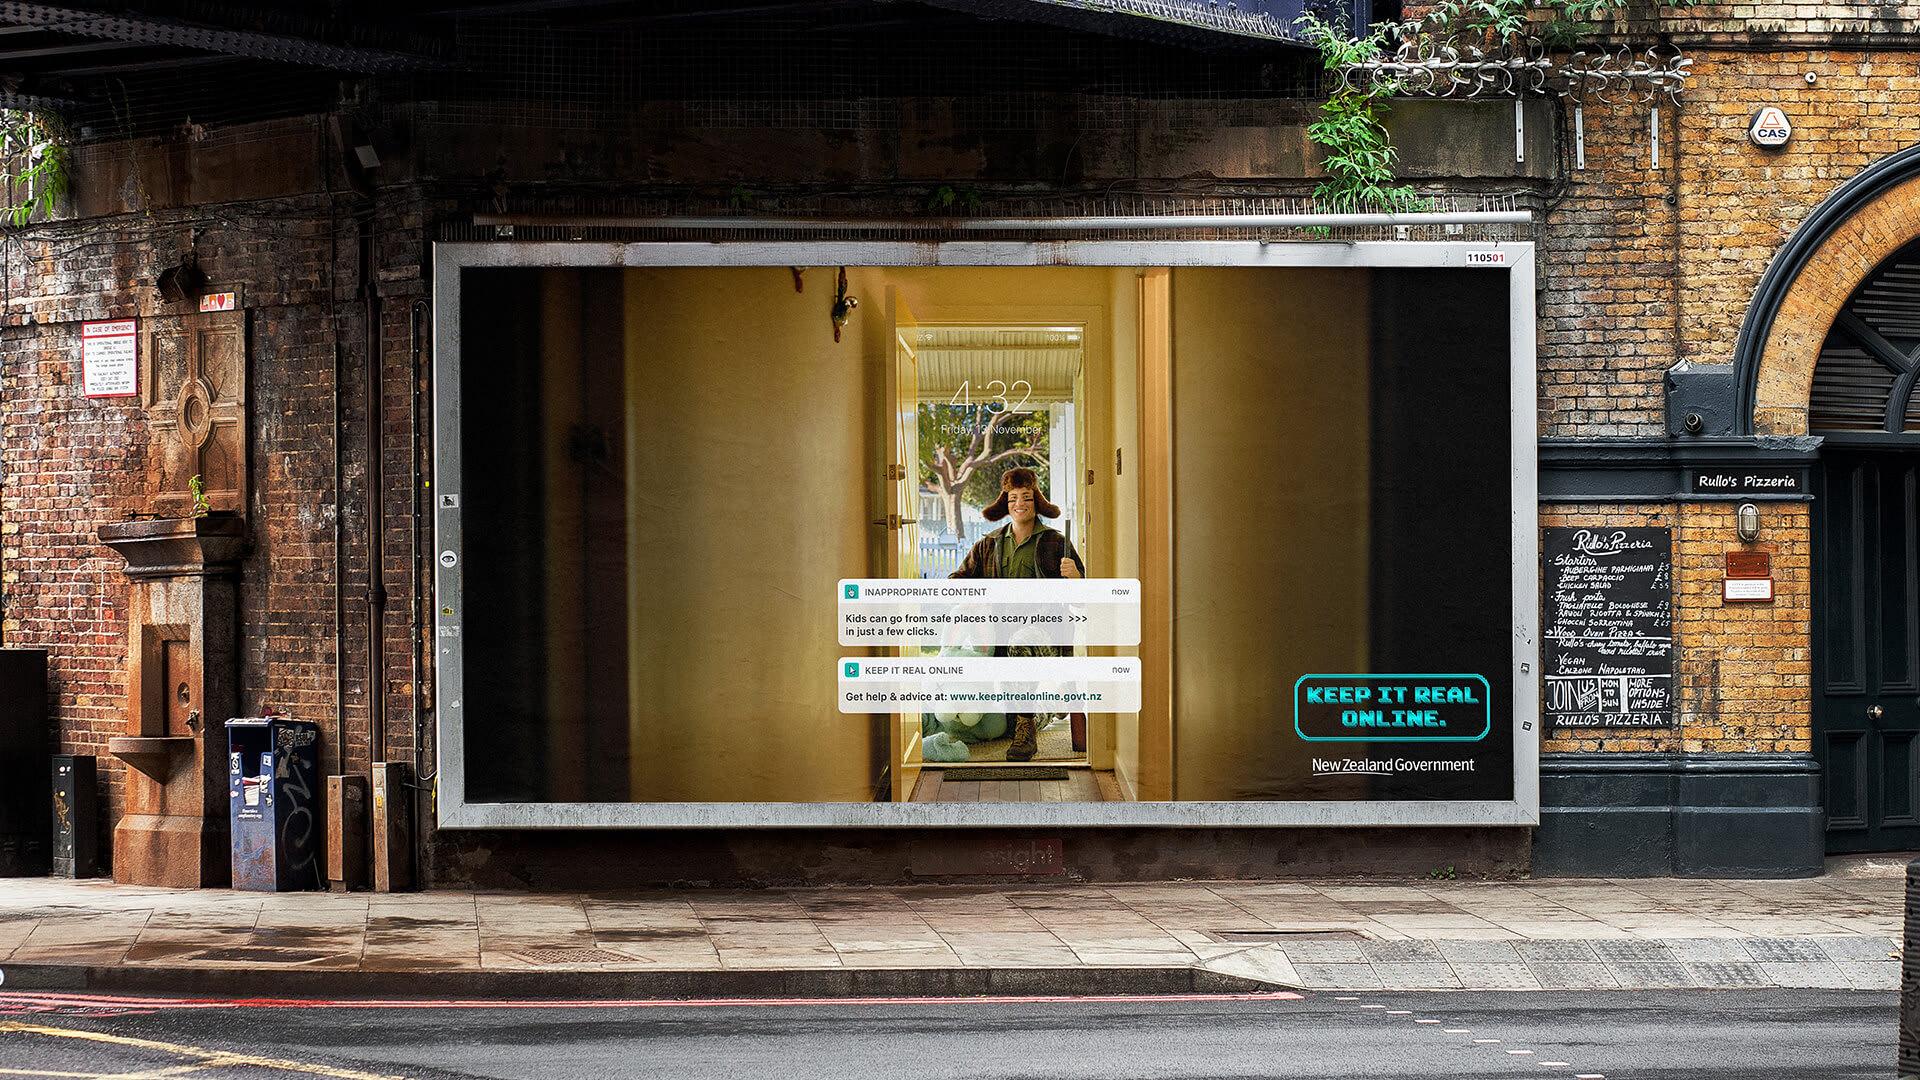 Keep it real online billboard